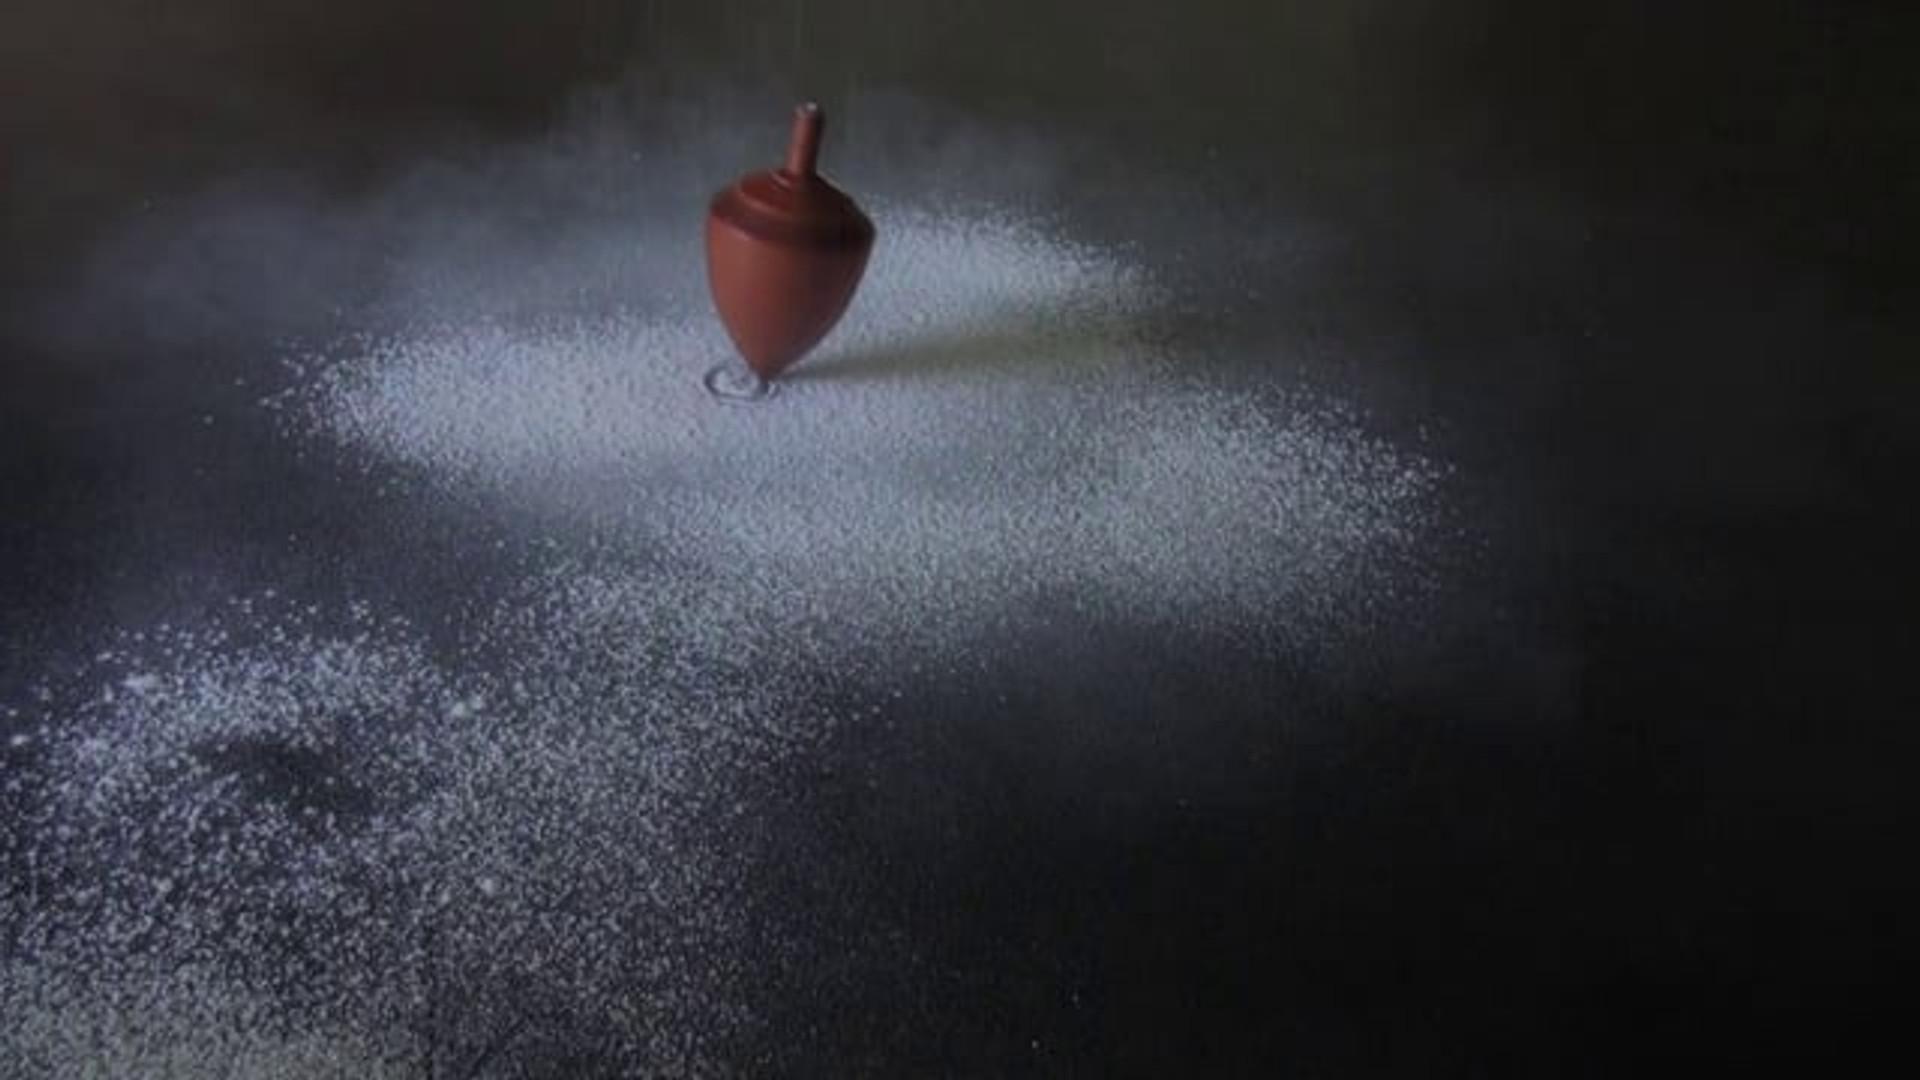 Denise Batchelor - stills from Oscillate (2013), HD Video; 03:27.  Courtesy of the artist.